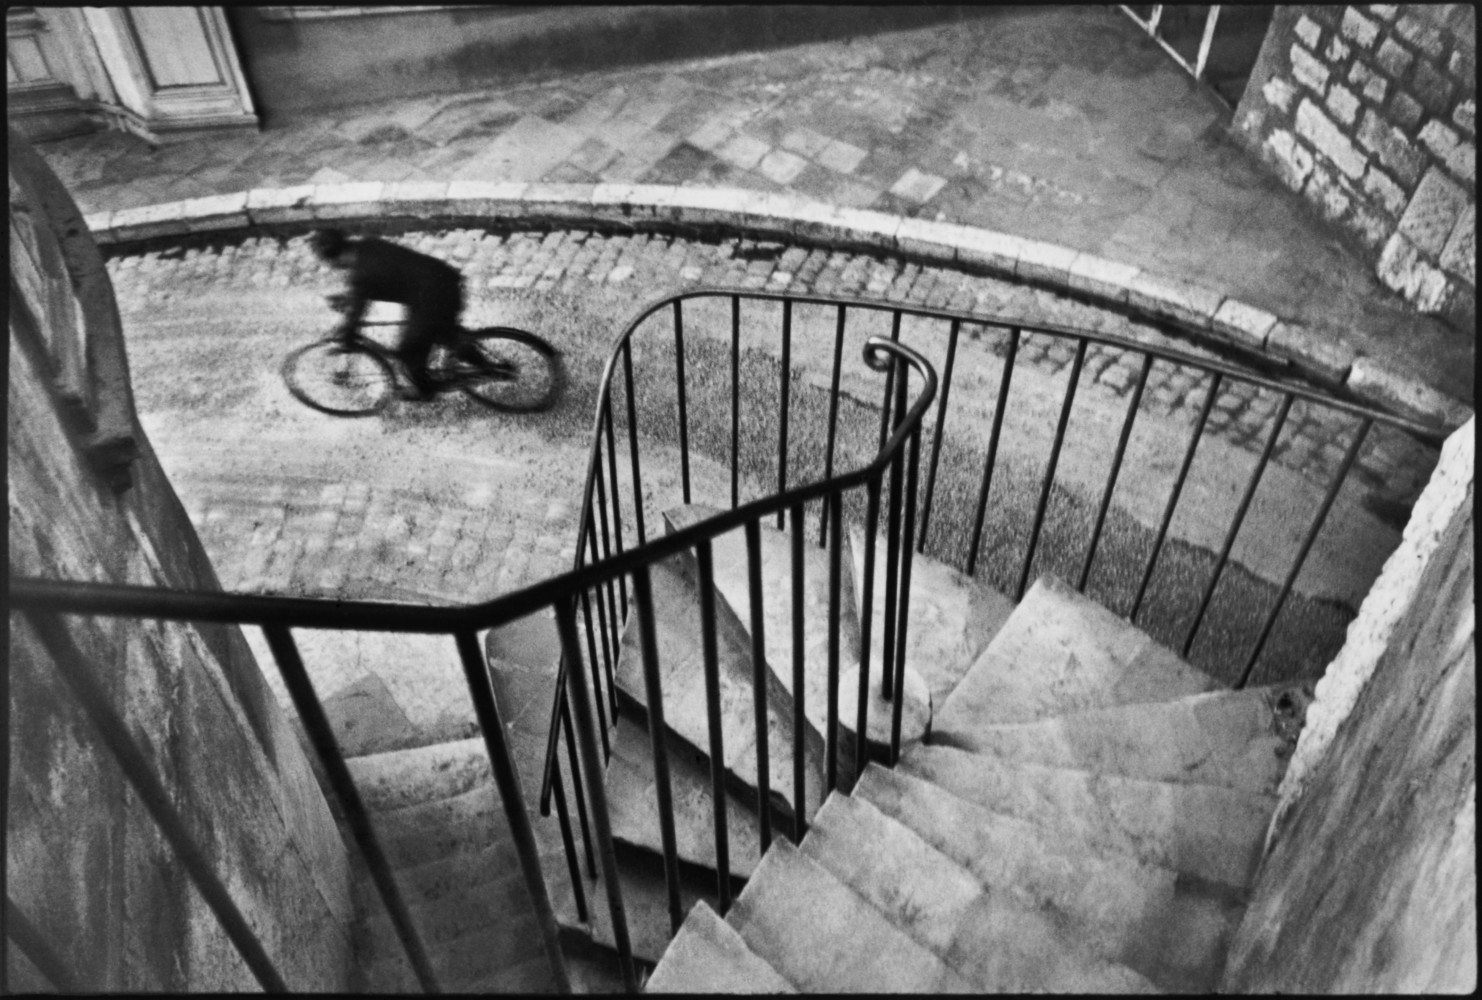 Henri Cartier-Bresson: Principles of a Practice • Magnum Photos